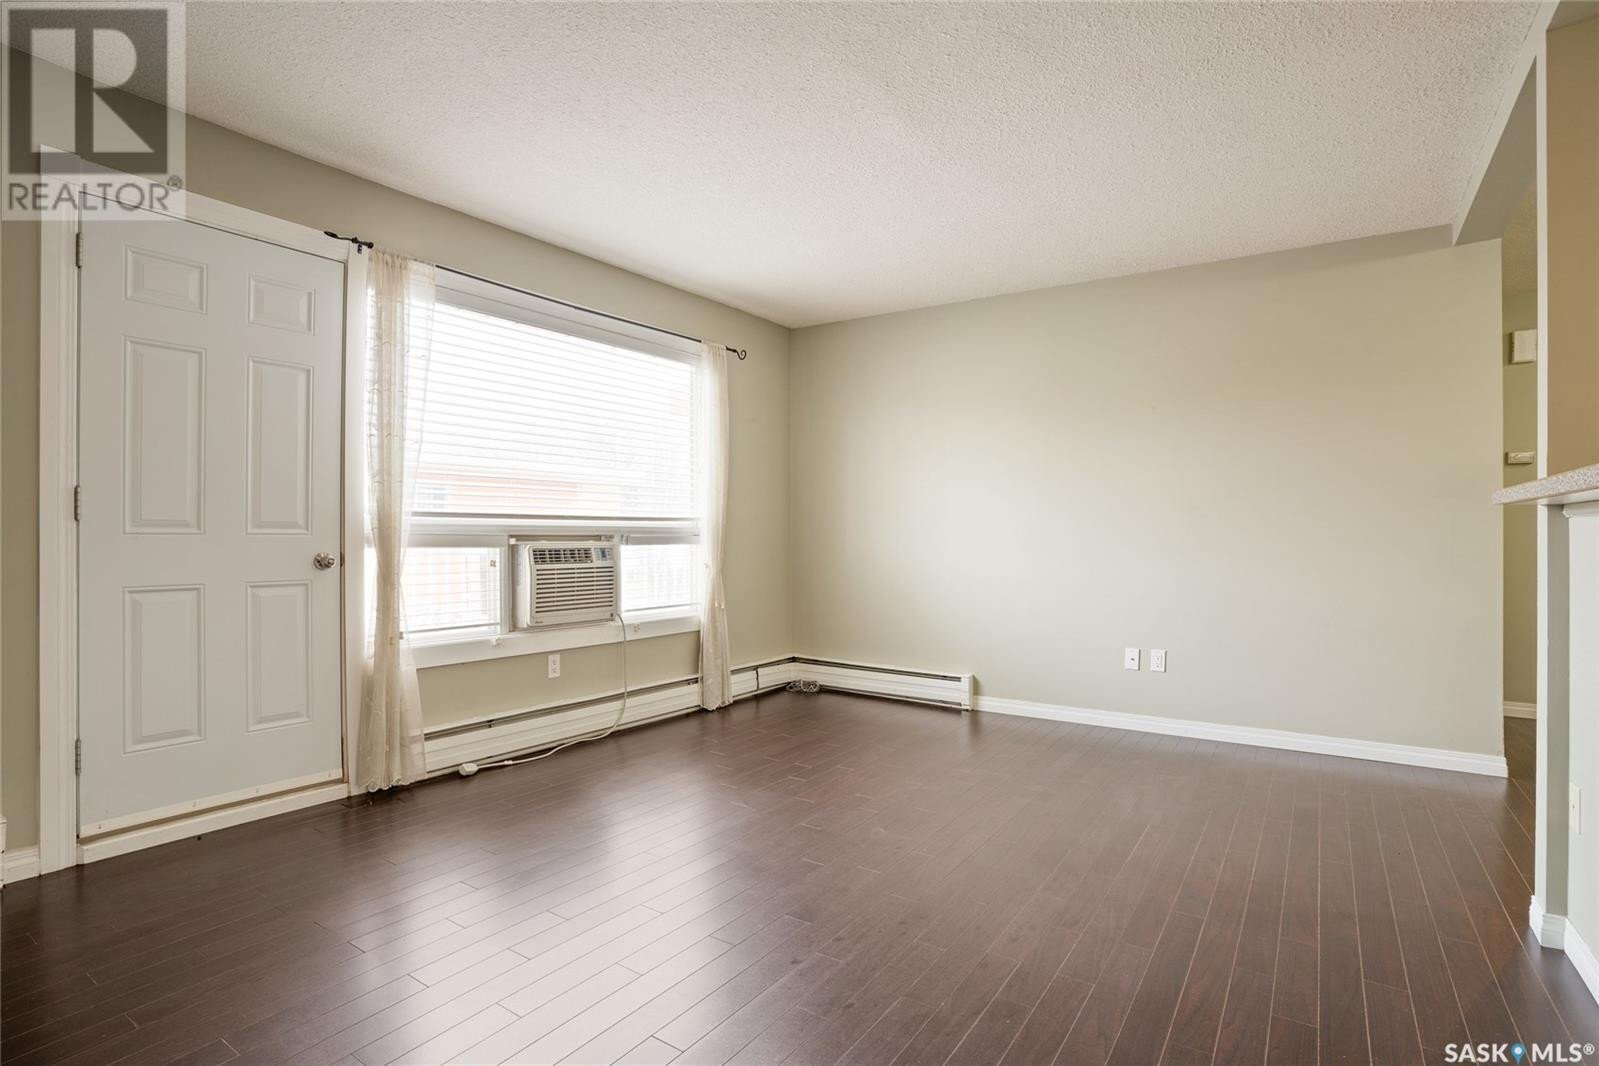 Condo for sale at 50 Spence St Unit 20 Regina Saskatchewan - MLS: SK839199